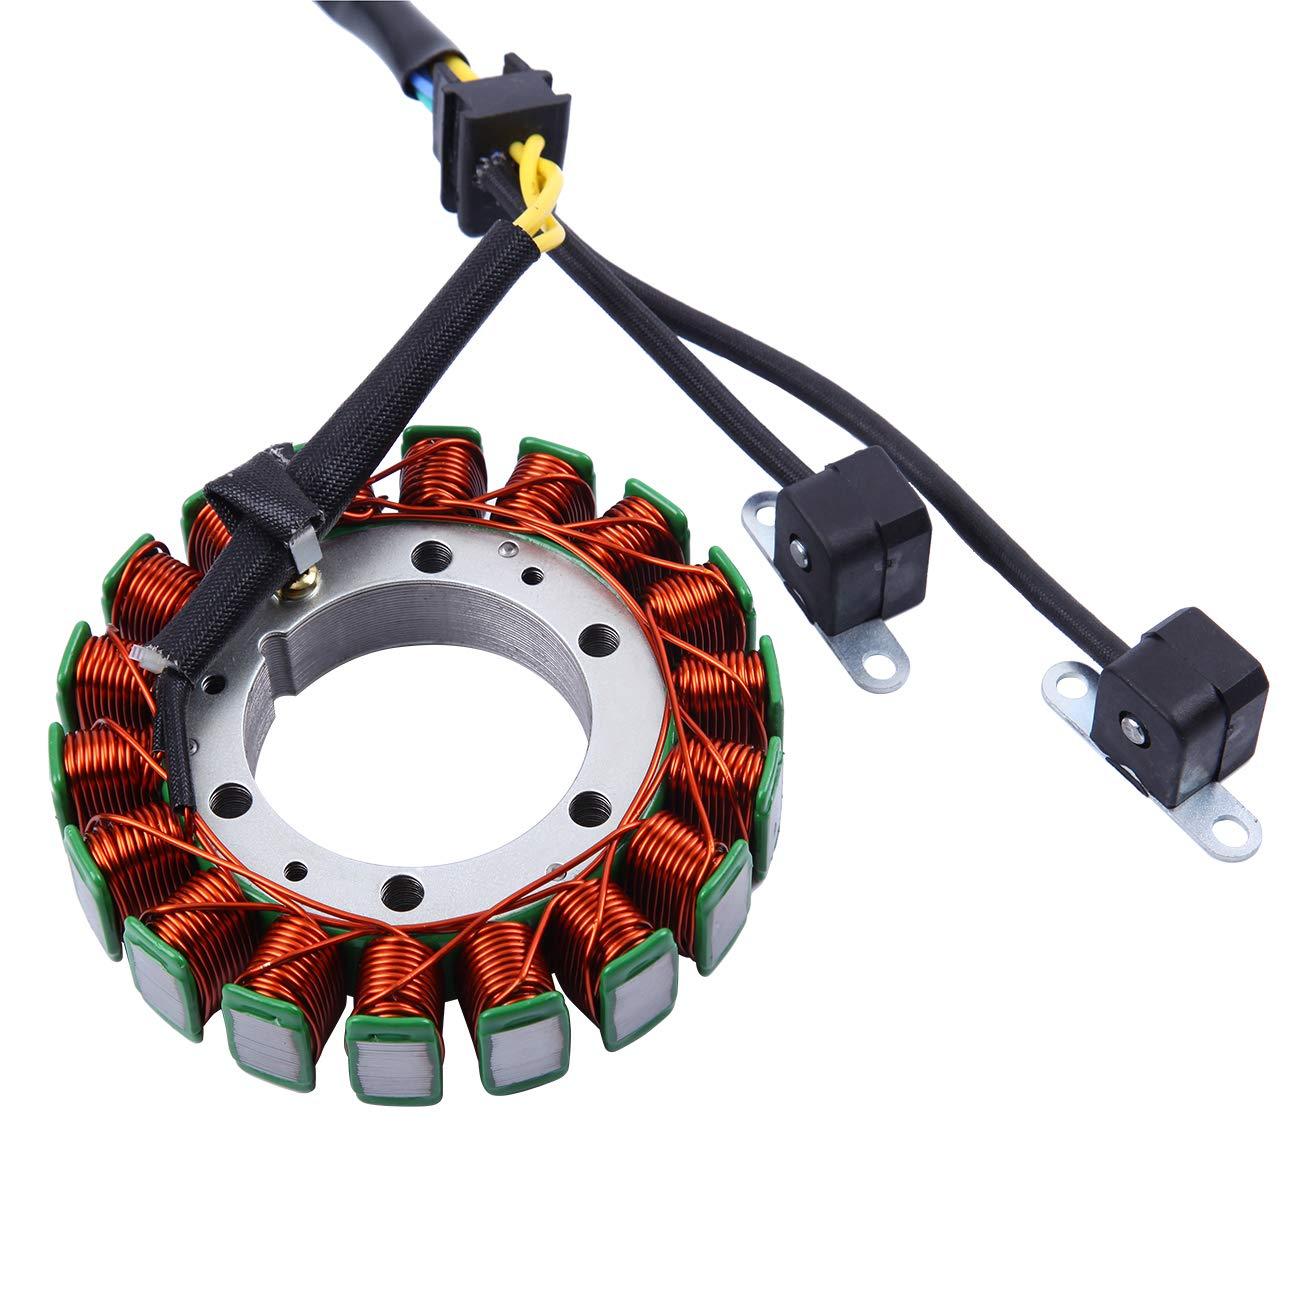 Ambienceo Regulator Rectifier Magneto Generator Engine Stator Coil for Suzuki VS1400GLP VS1400 GLP Intruder 1400 1987-2004